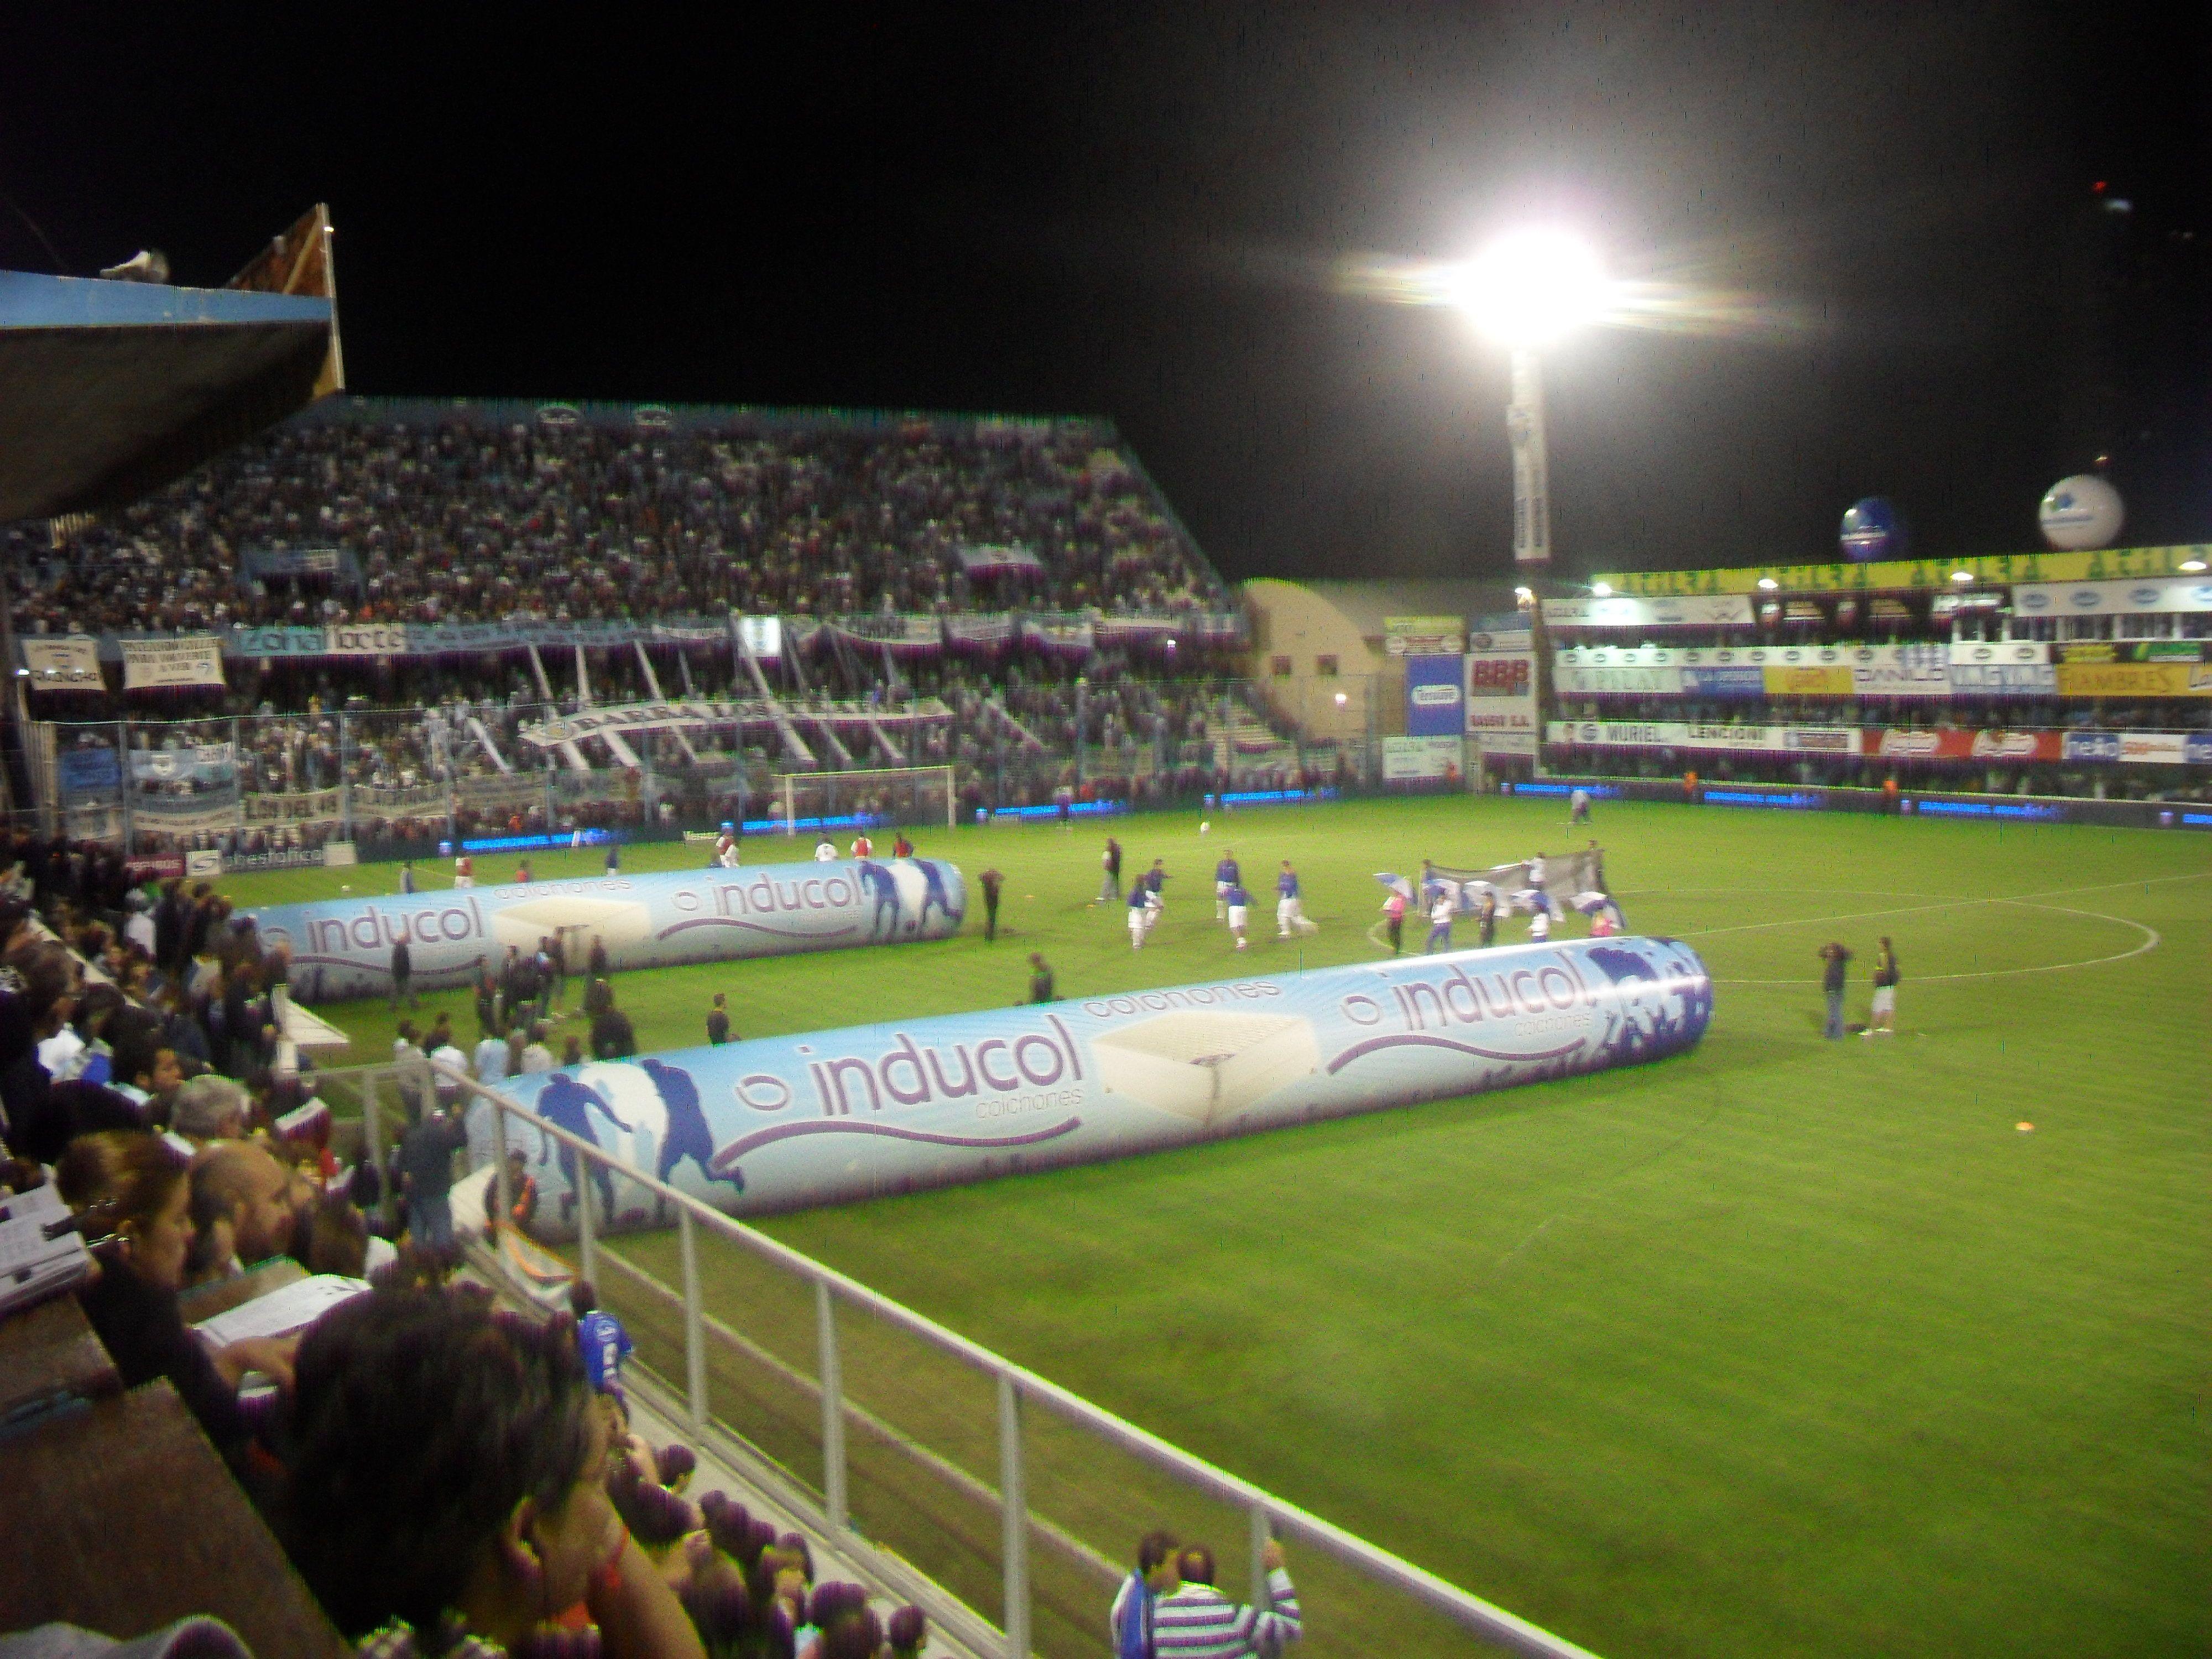 Atlético vs. San Martín SJ